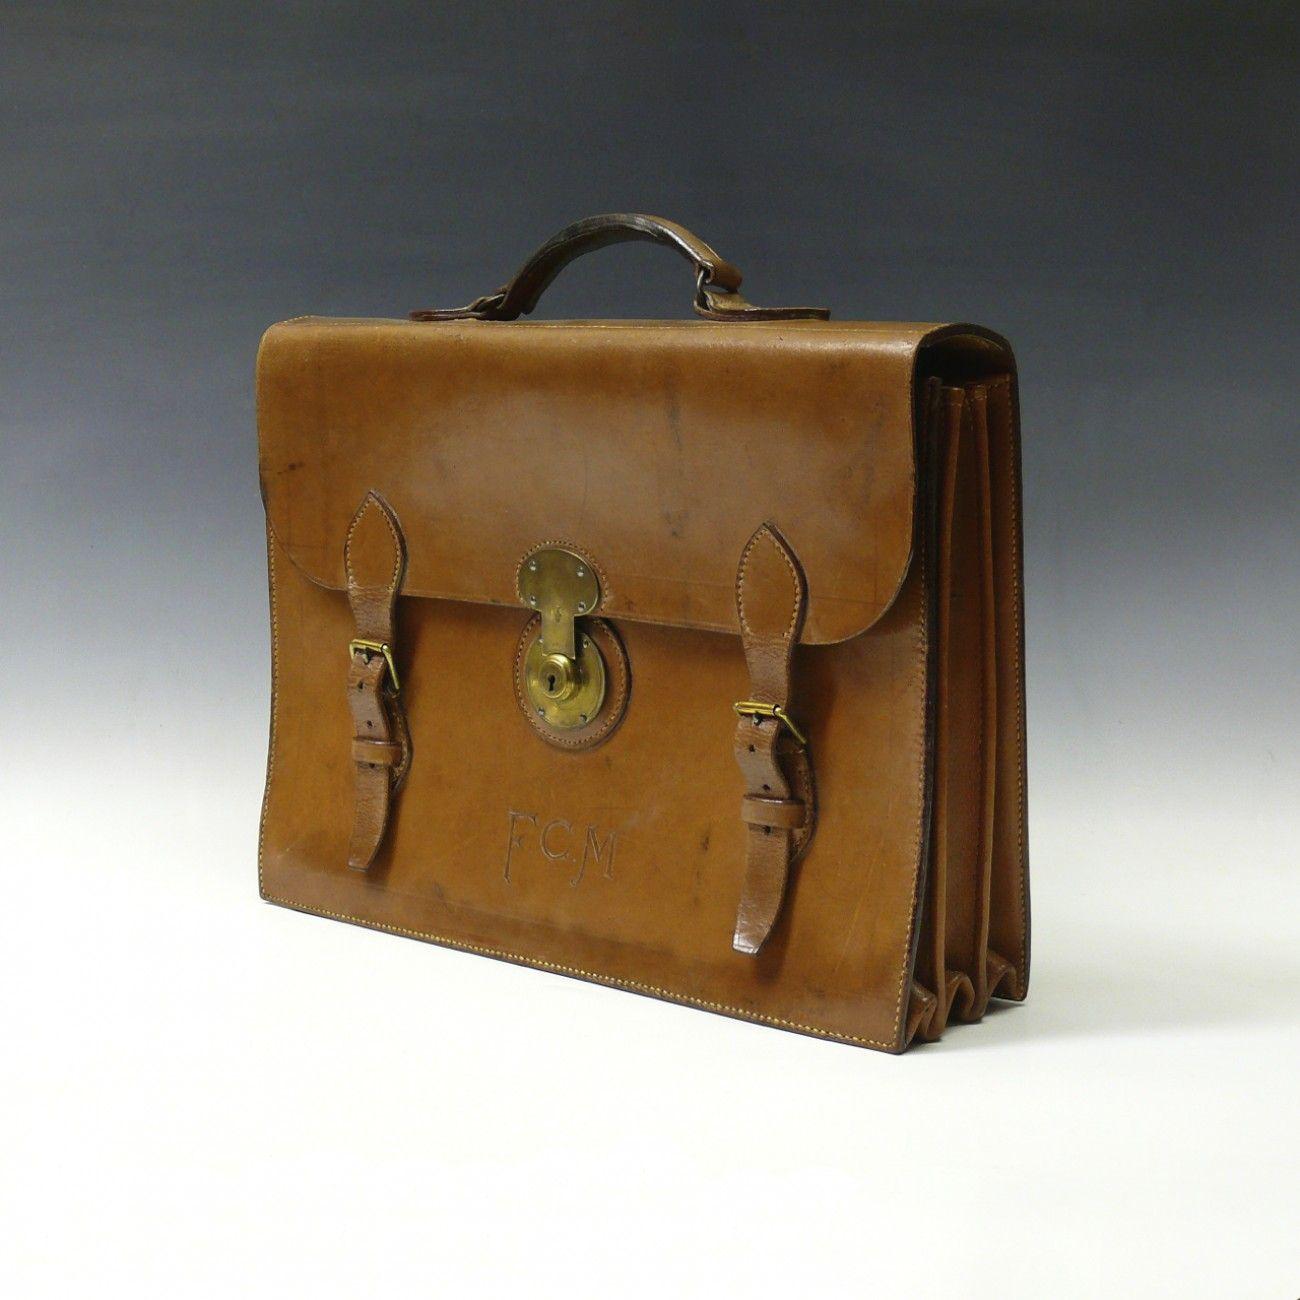 Bentleys — F.C.M Leather Briefcase — Vintage Luggage